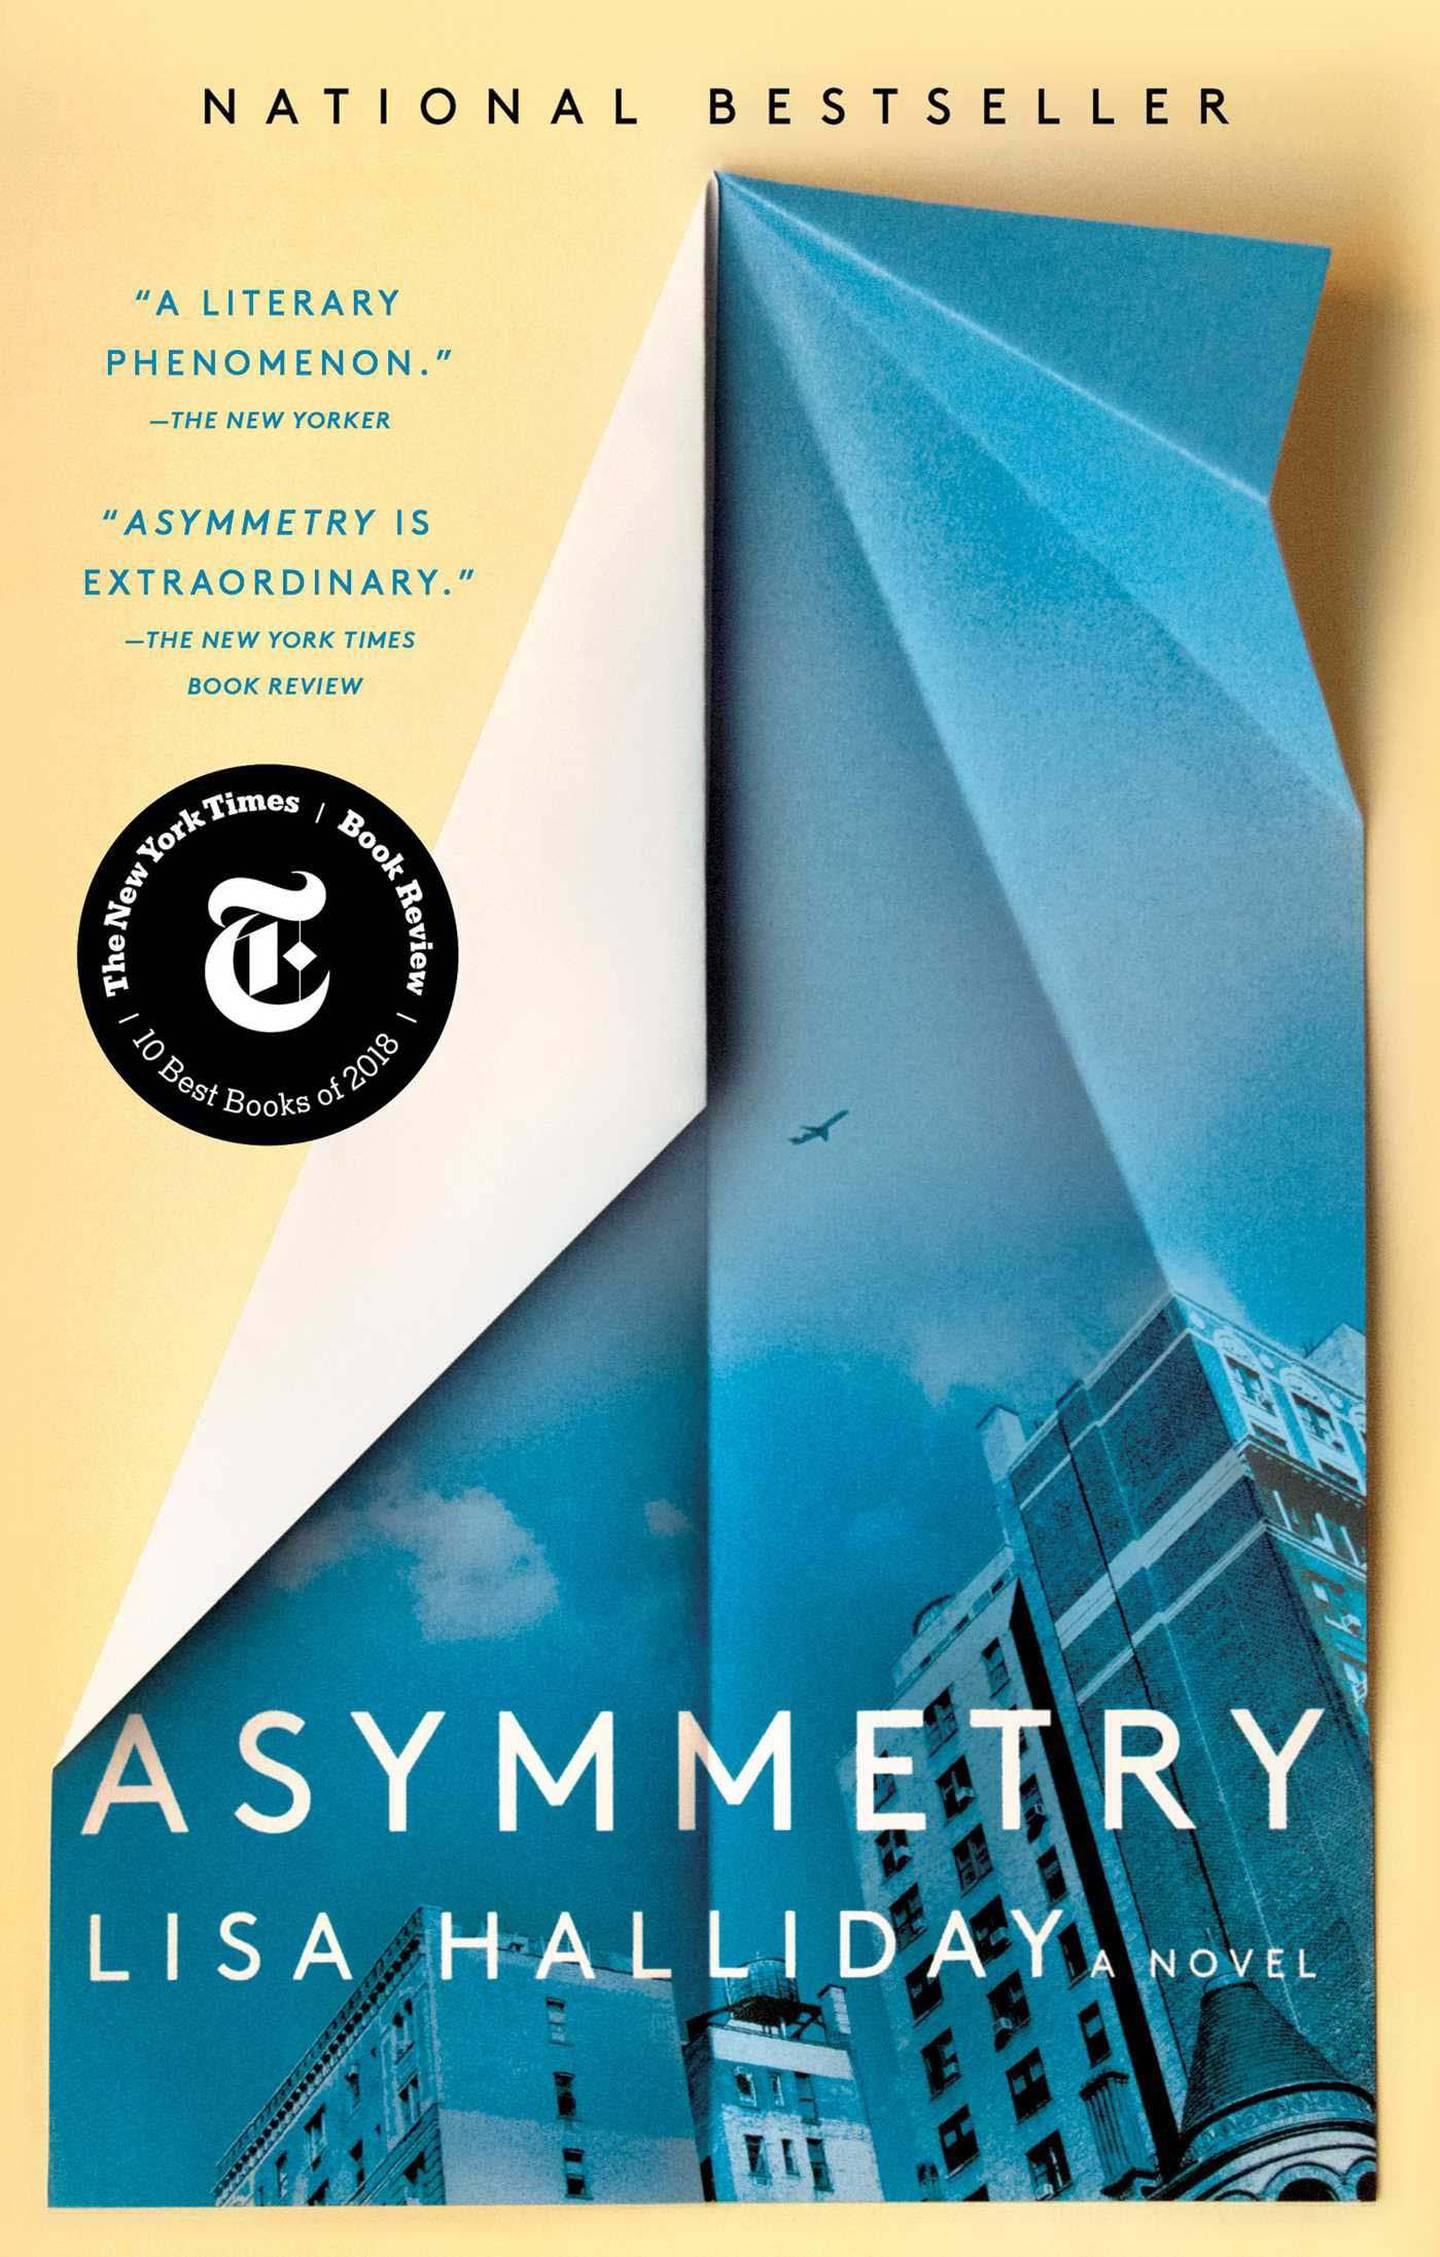 Asymmetry: A Novel by Lisa Halliday. Courtesy Simon & Schuster